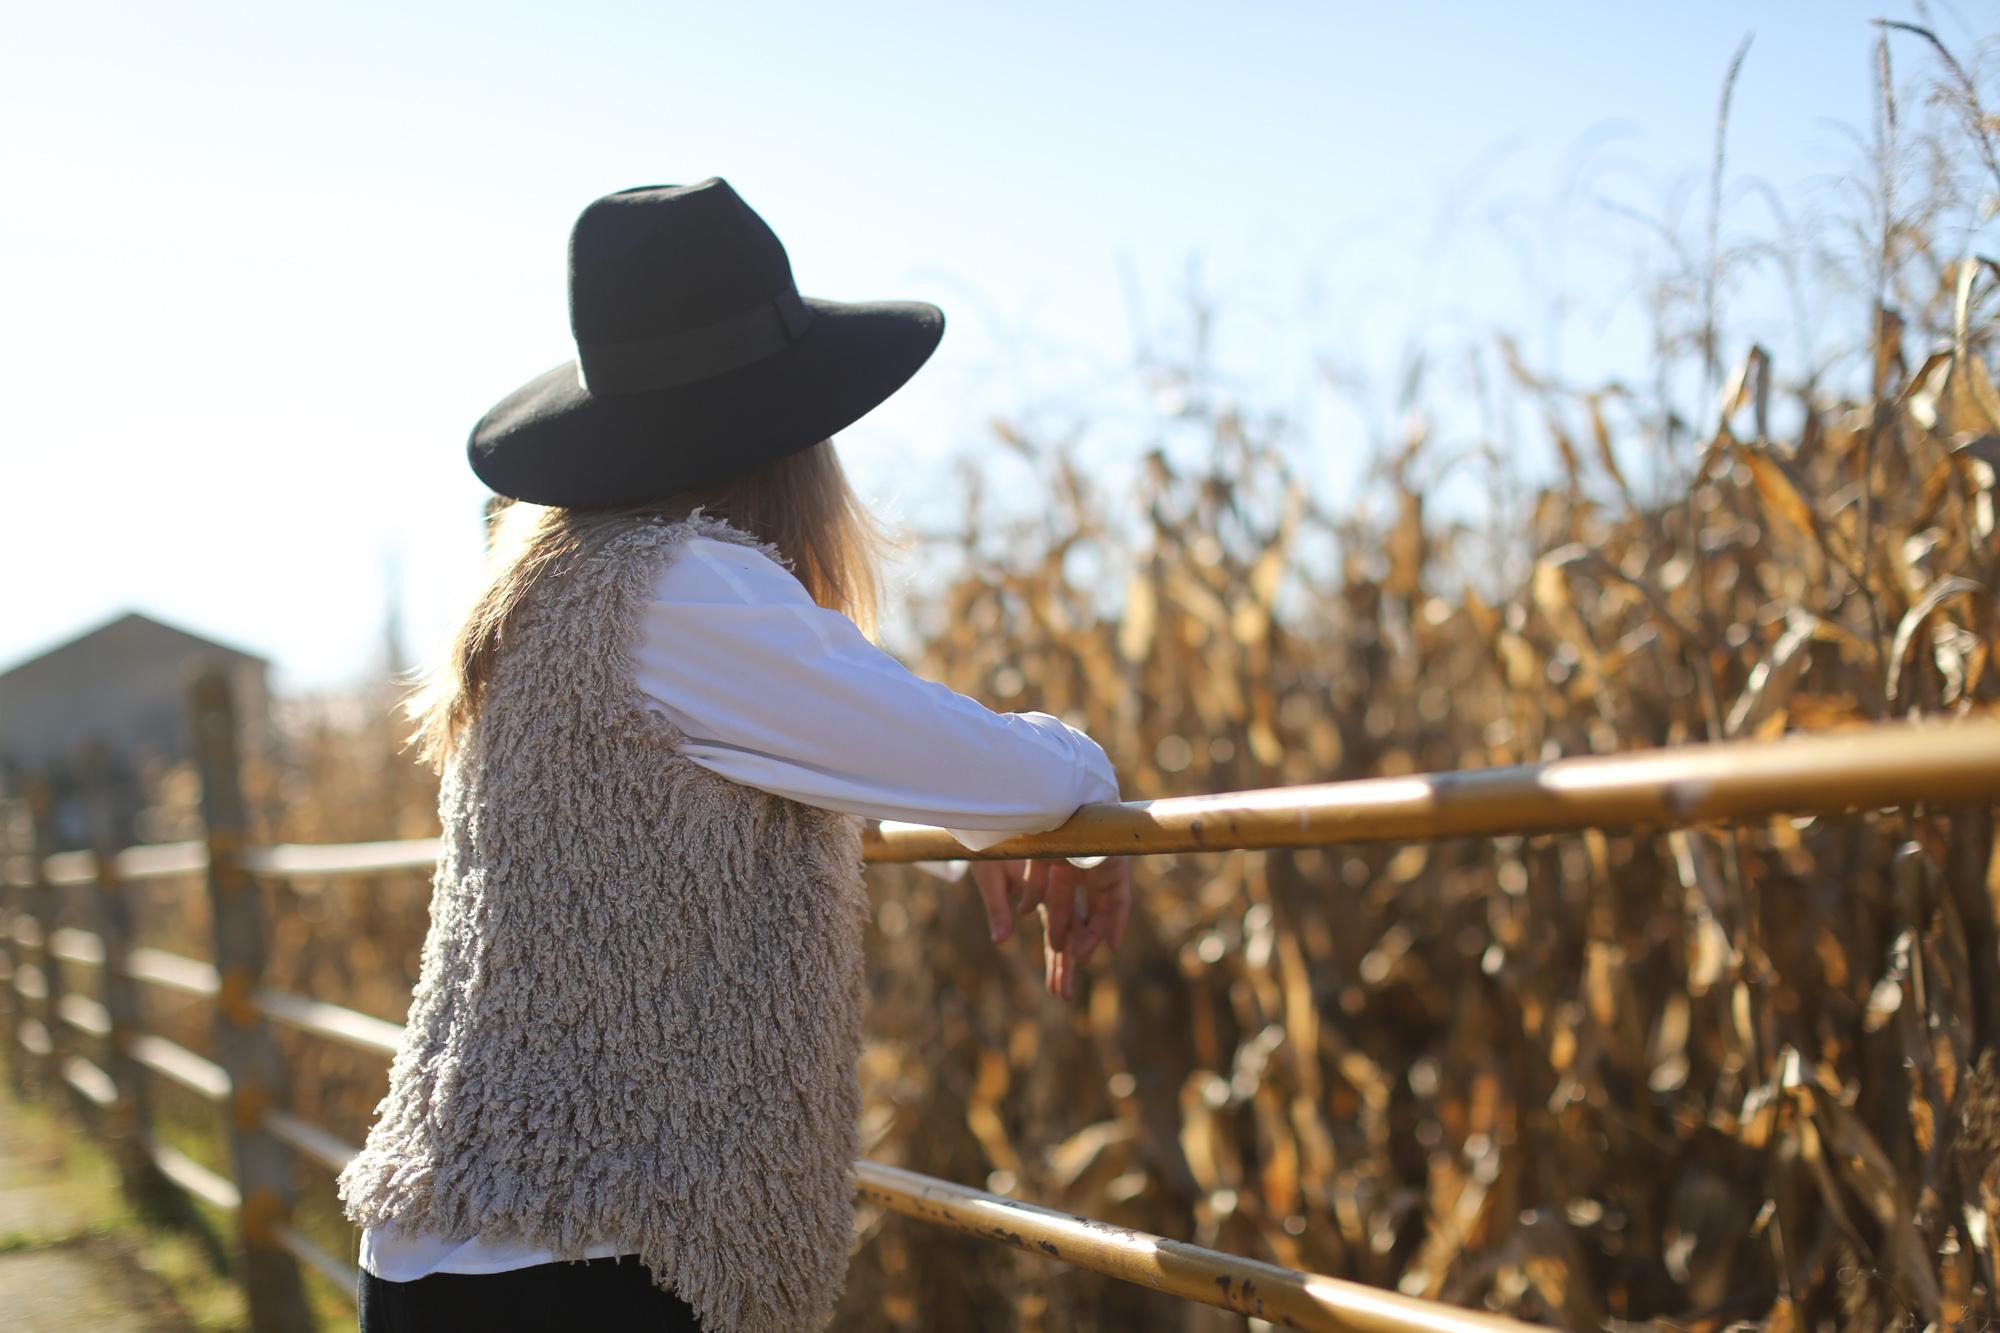 Clochet_streetstyle_cowboy_boots_fedora_hat_waistcoat-1-10